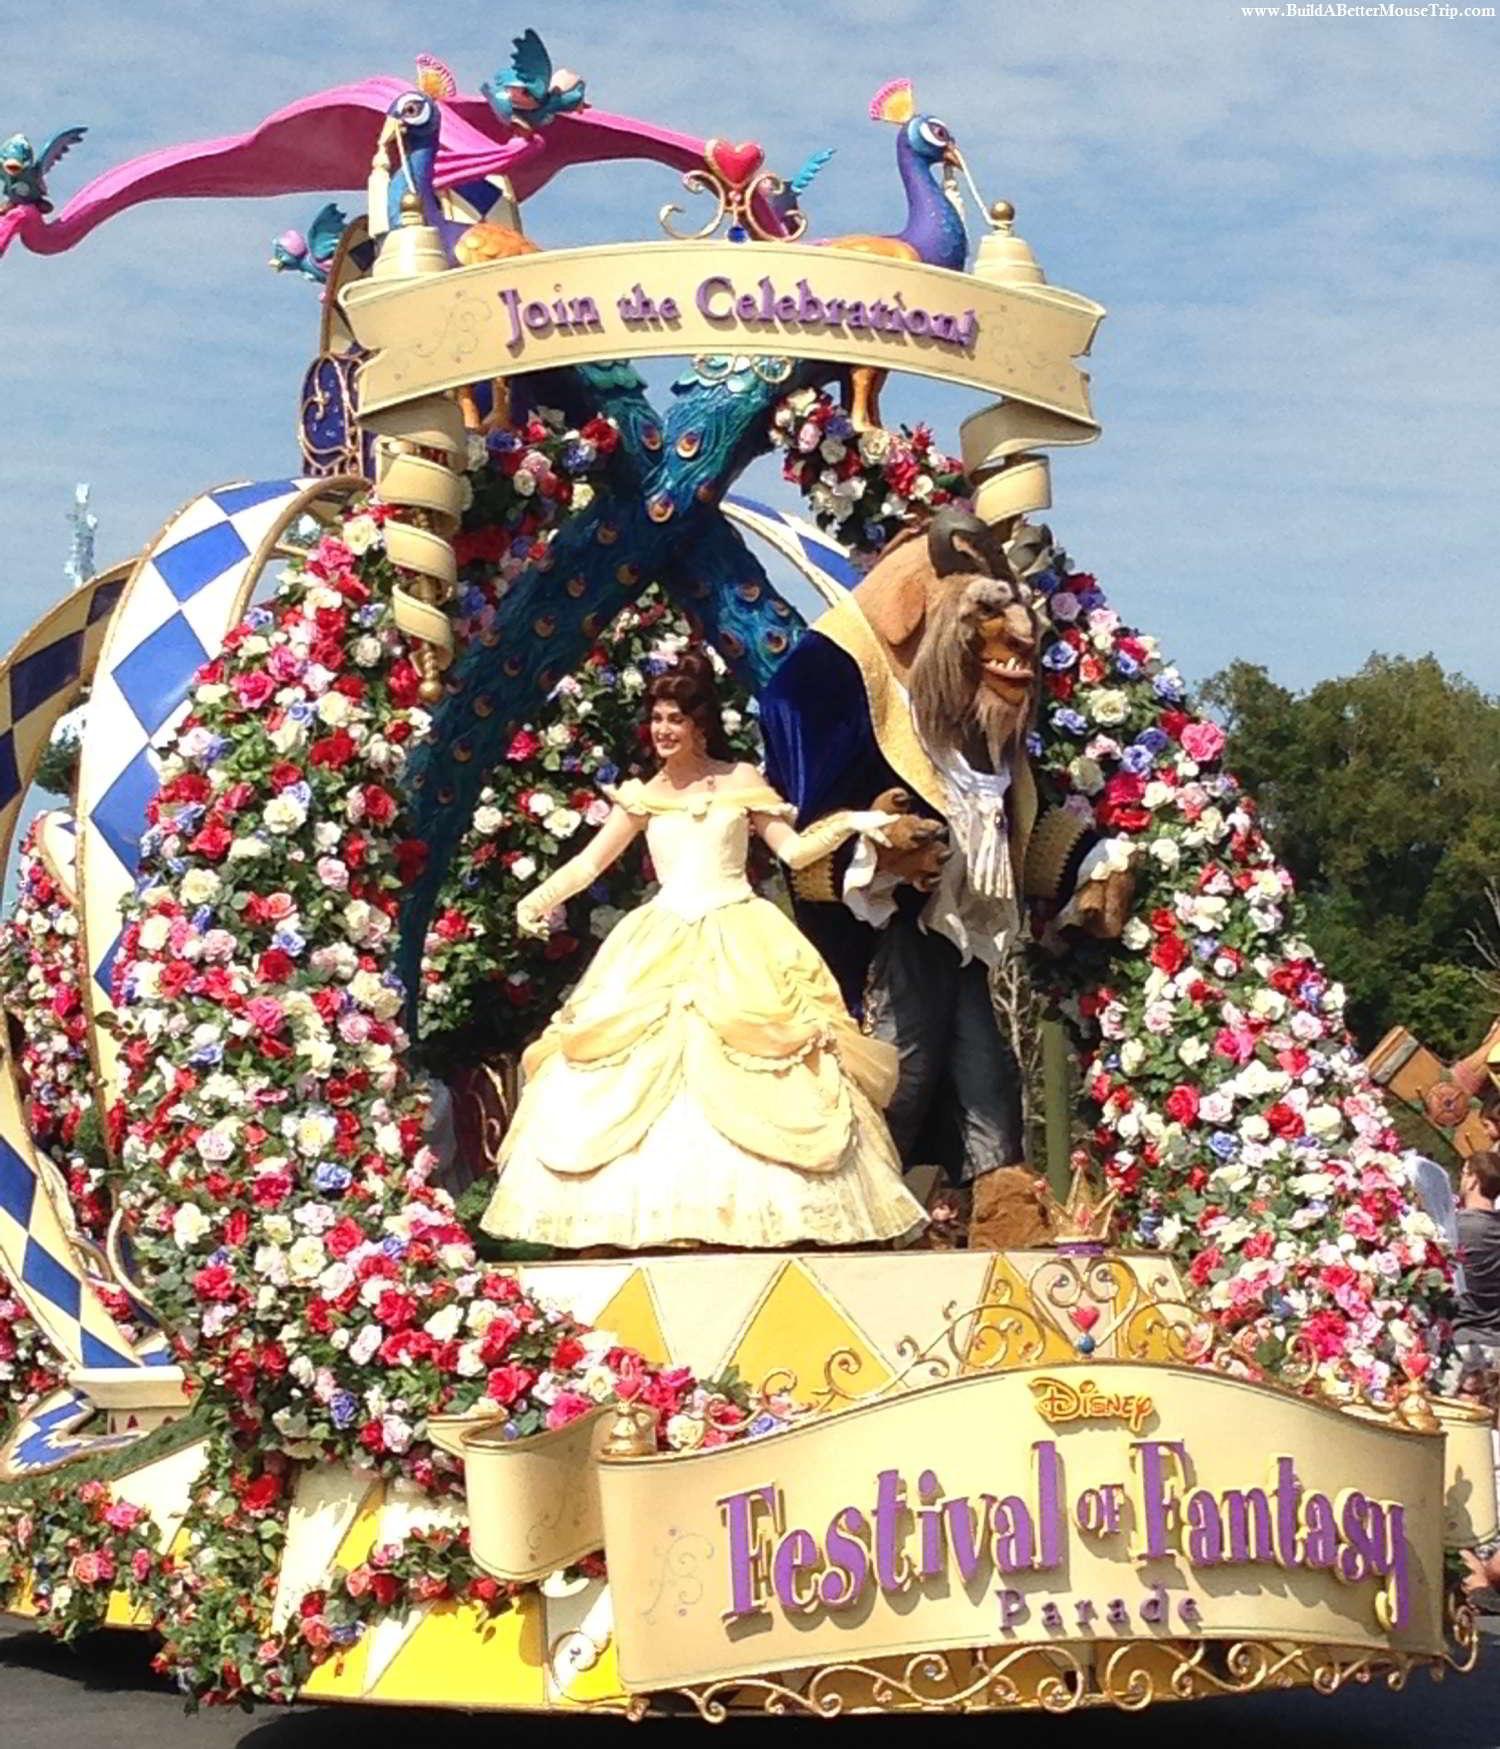 Princess Garden float in the Festival of Fantasy Parade in the Magic Kingdom at Disney World.